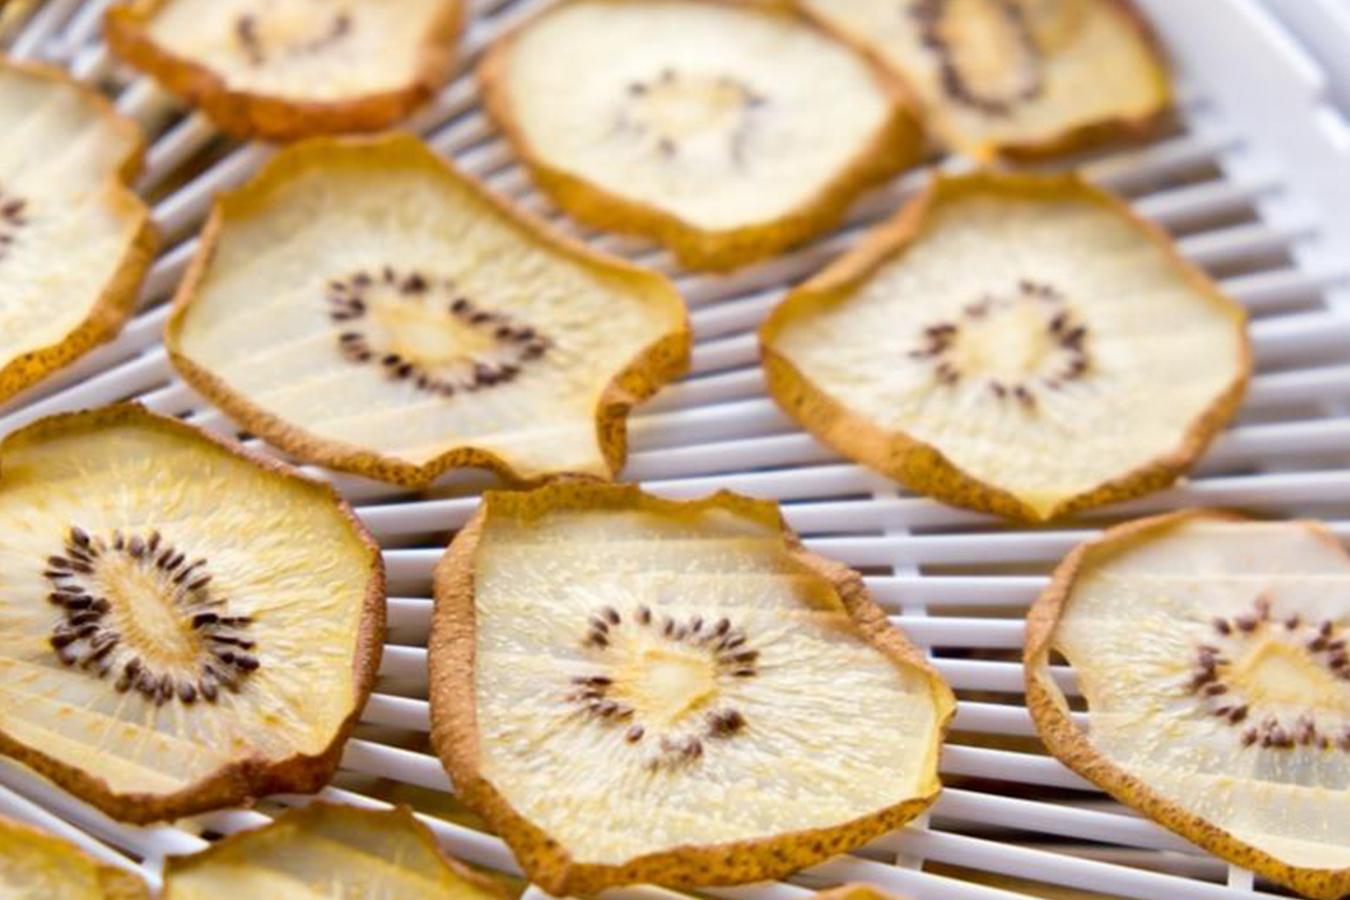 【TGA x 食力】善用果皮、保留營養 帶皮果乾成健康零食新趨勢